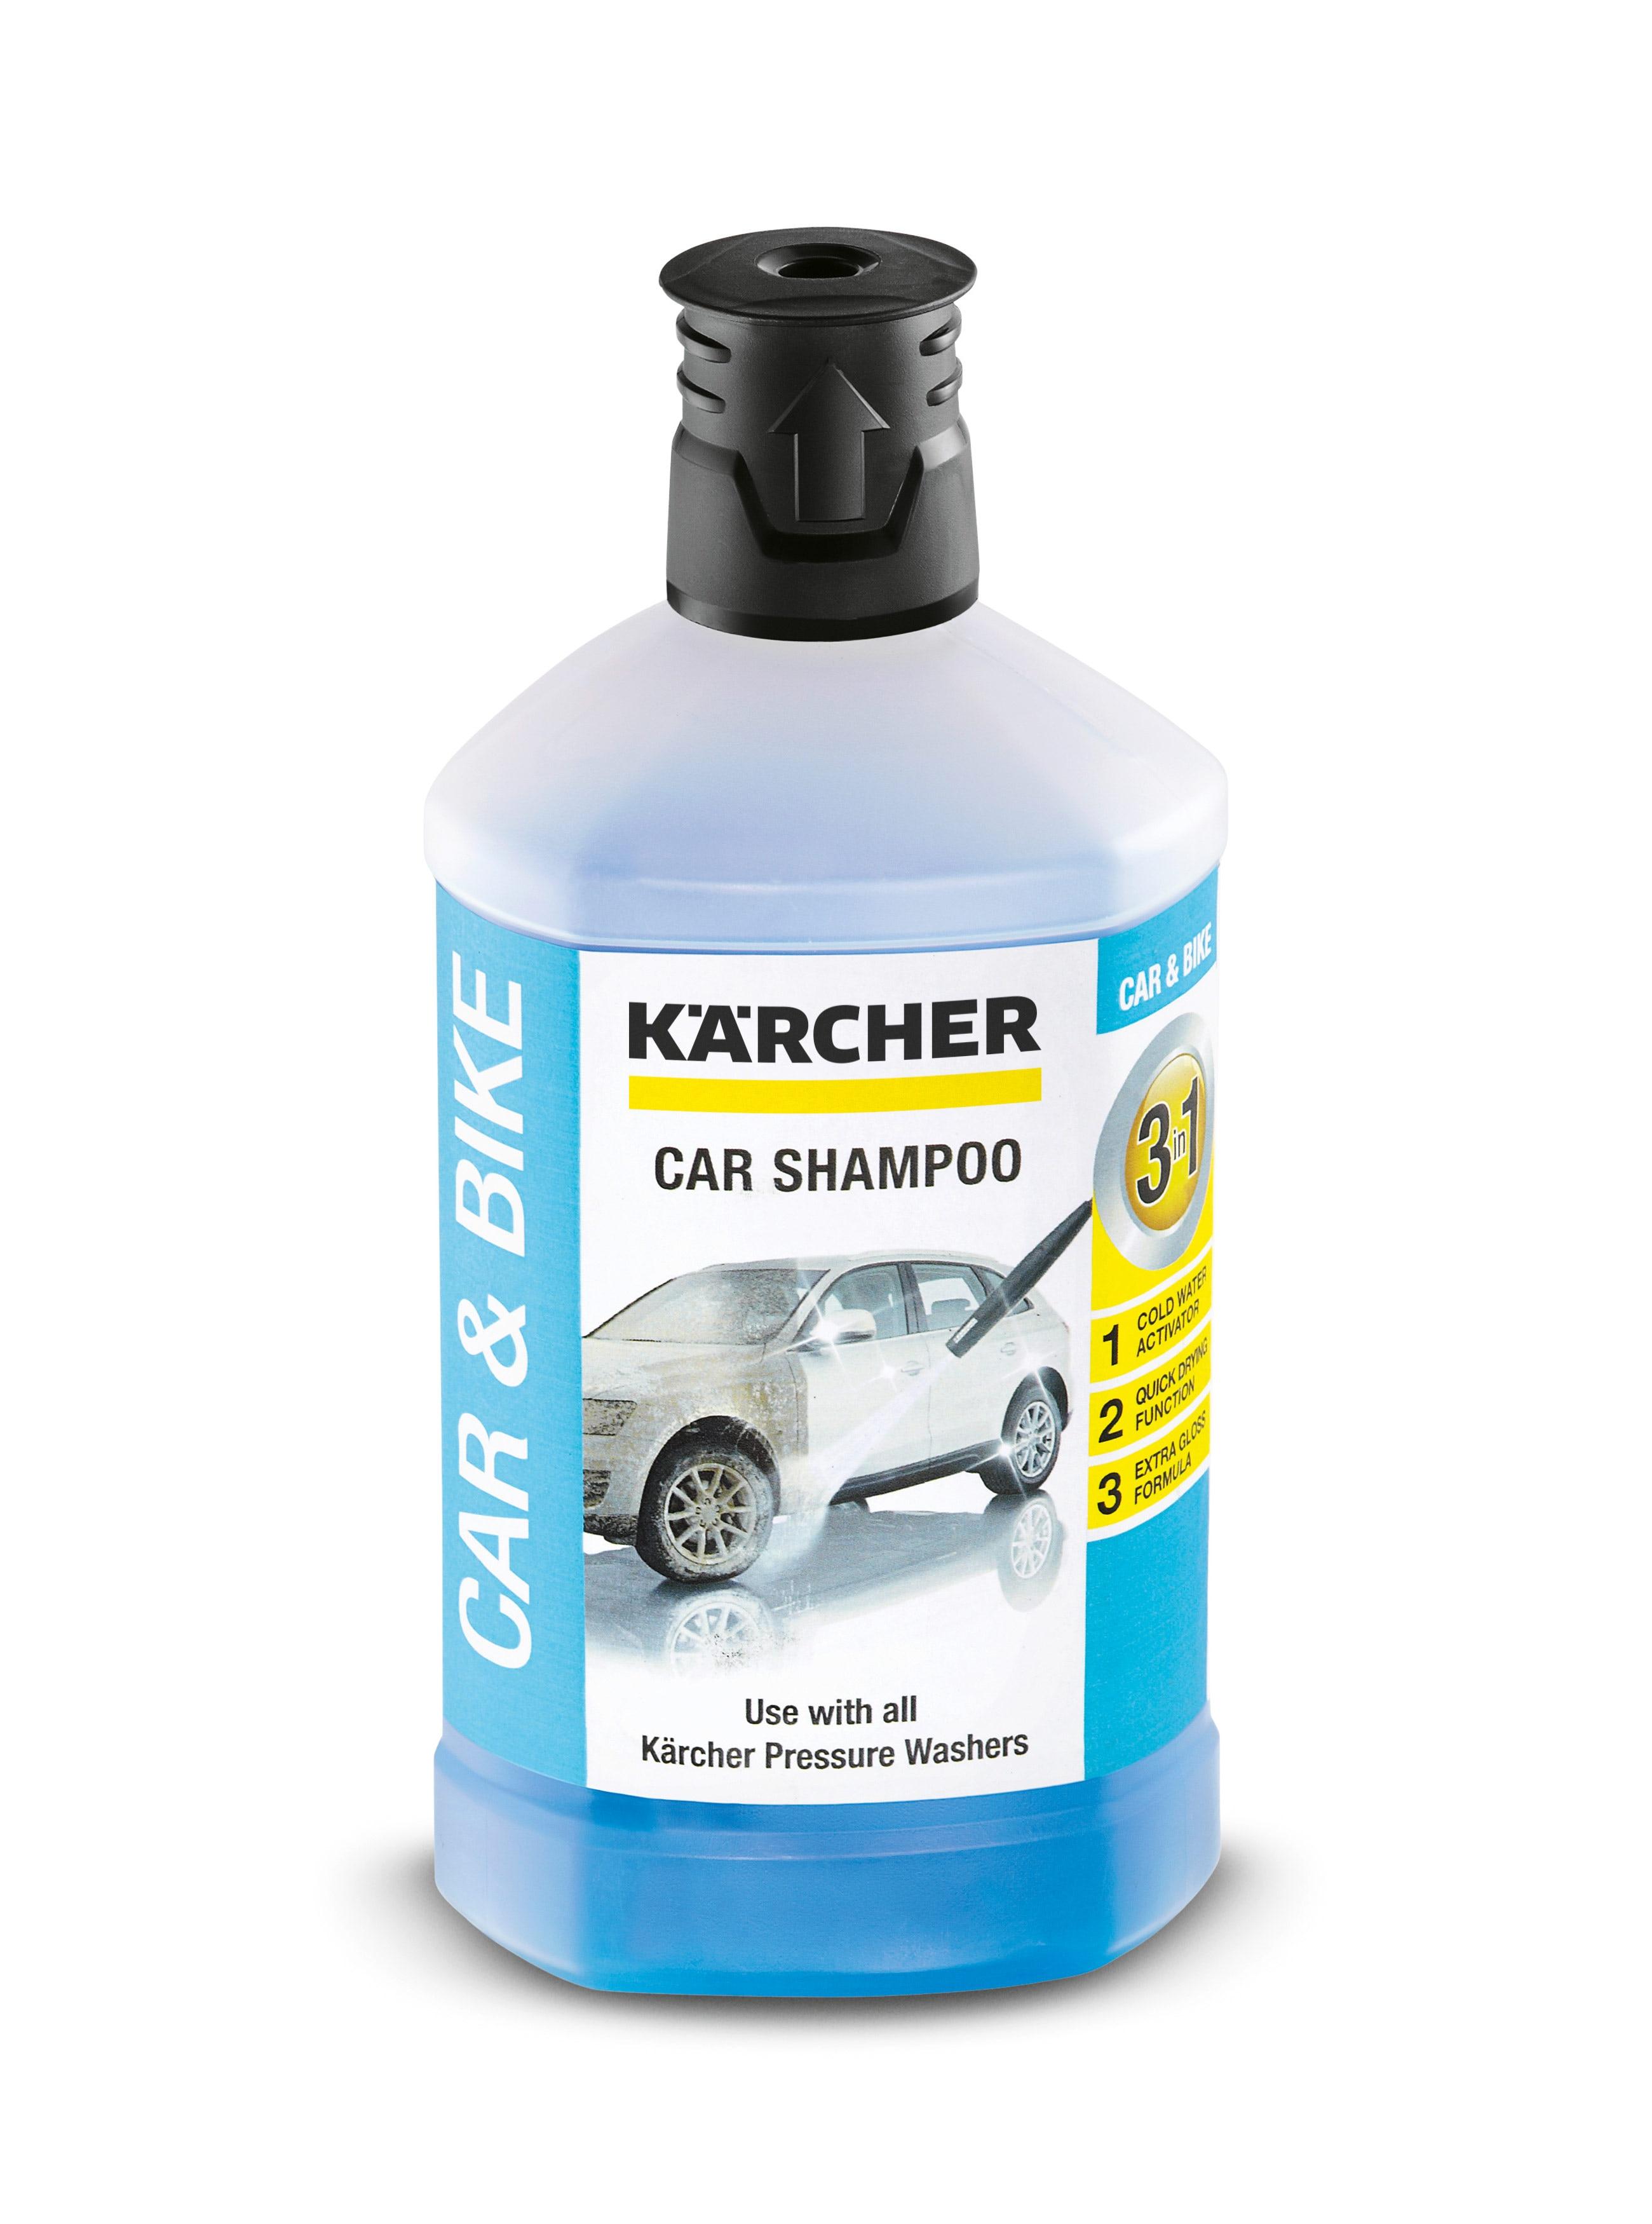 Rm610. Car Shampoo 3 In 1. (1 Liter) (6.295-750.0)